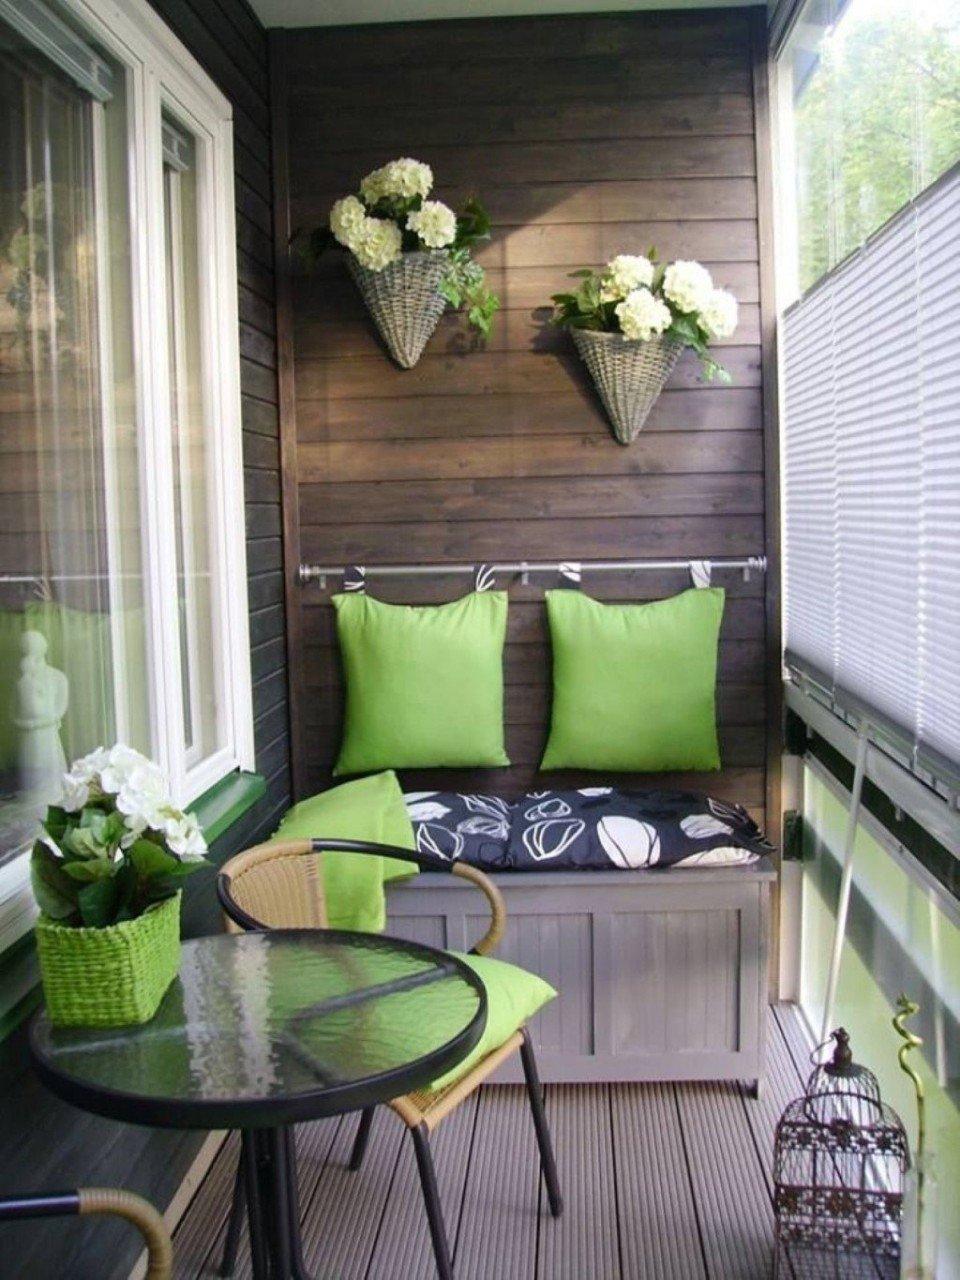 Top small balcony ideas image interior design gallery image .